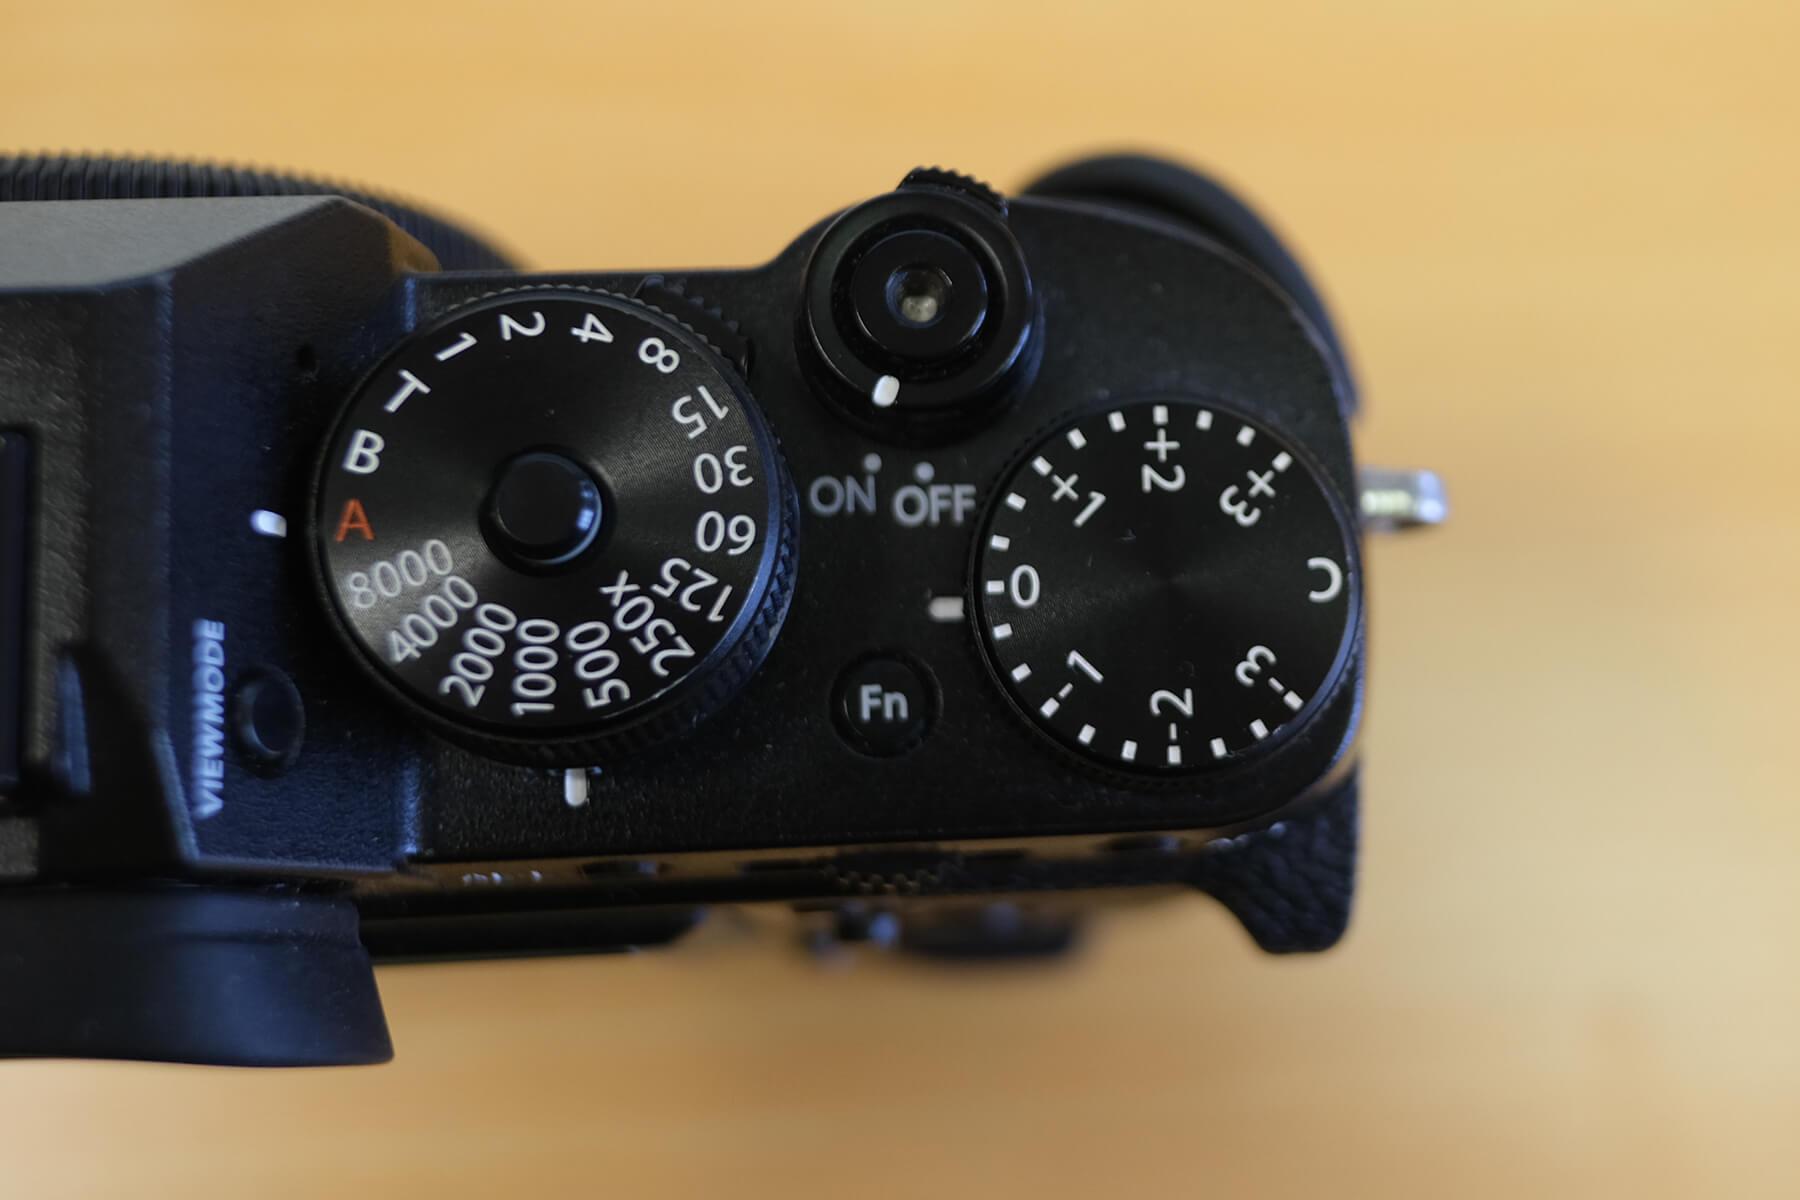 Camera exposure compensation dial